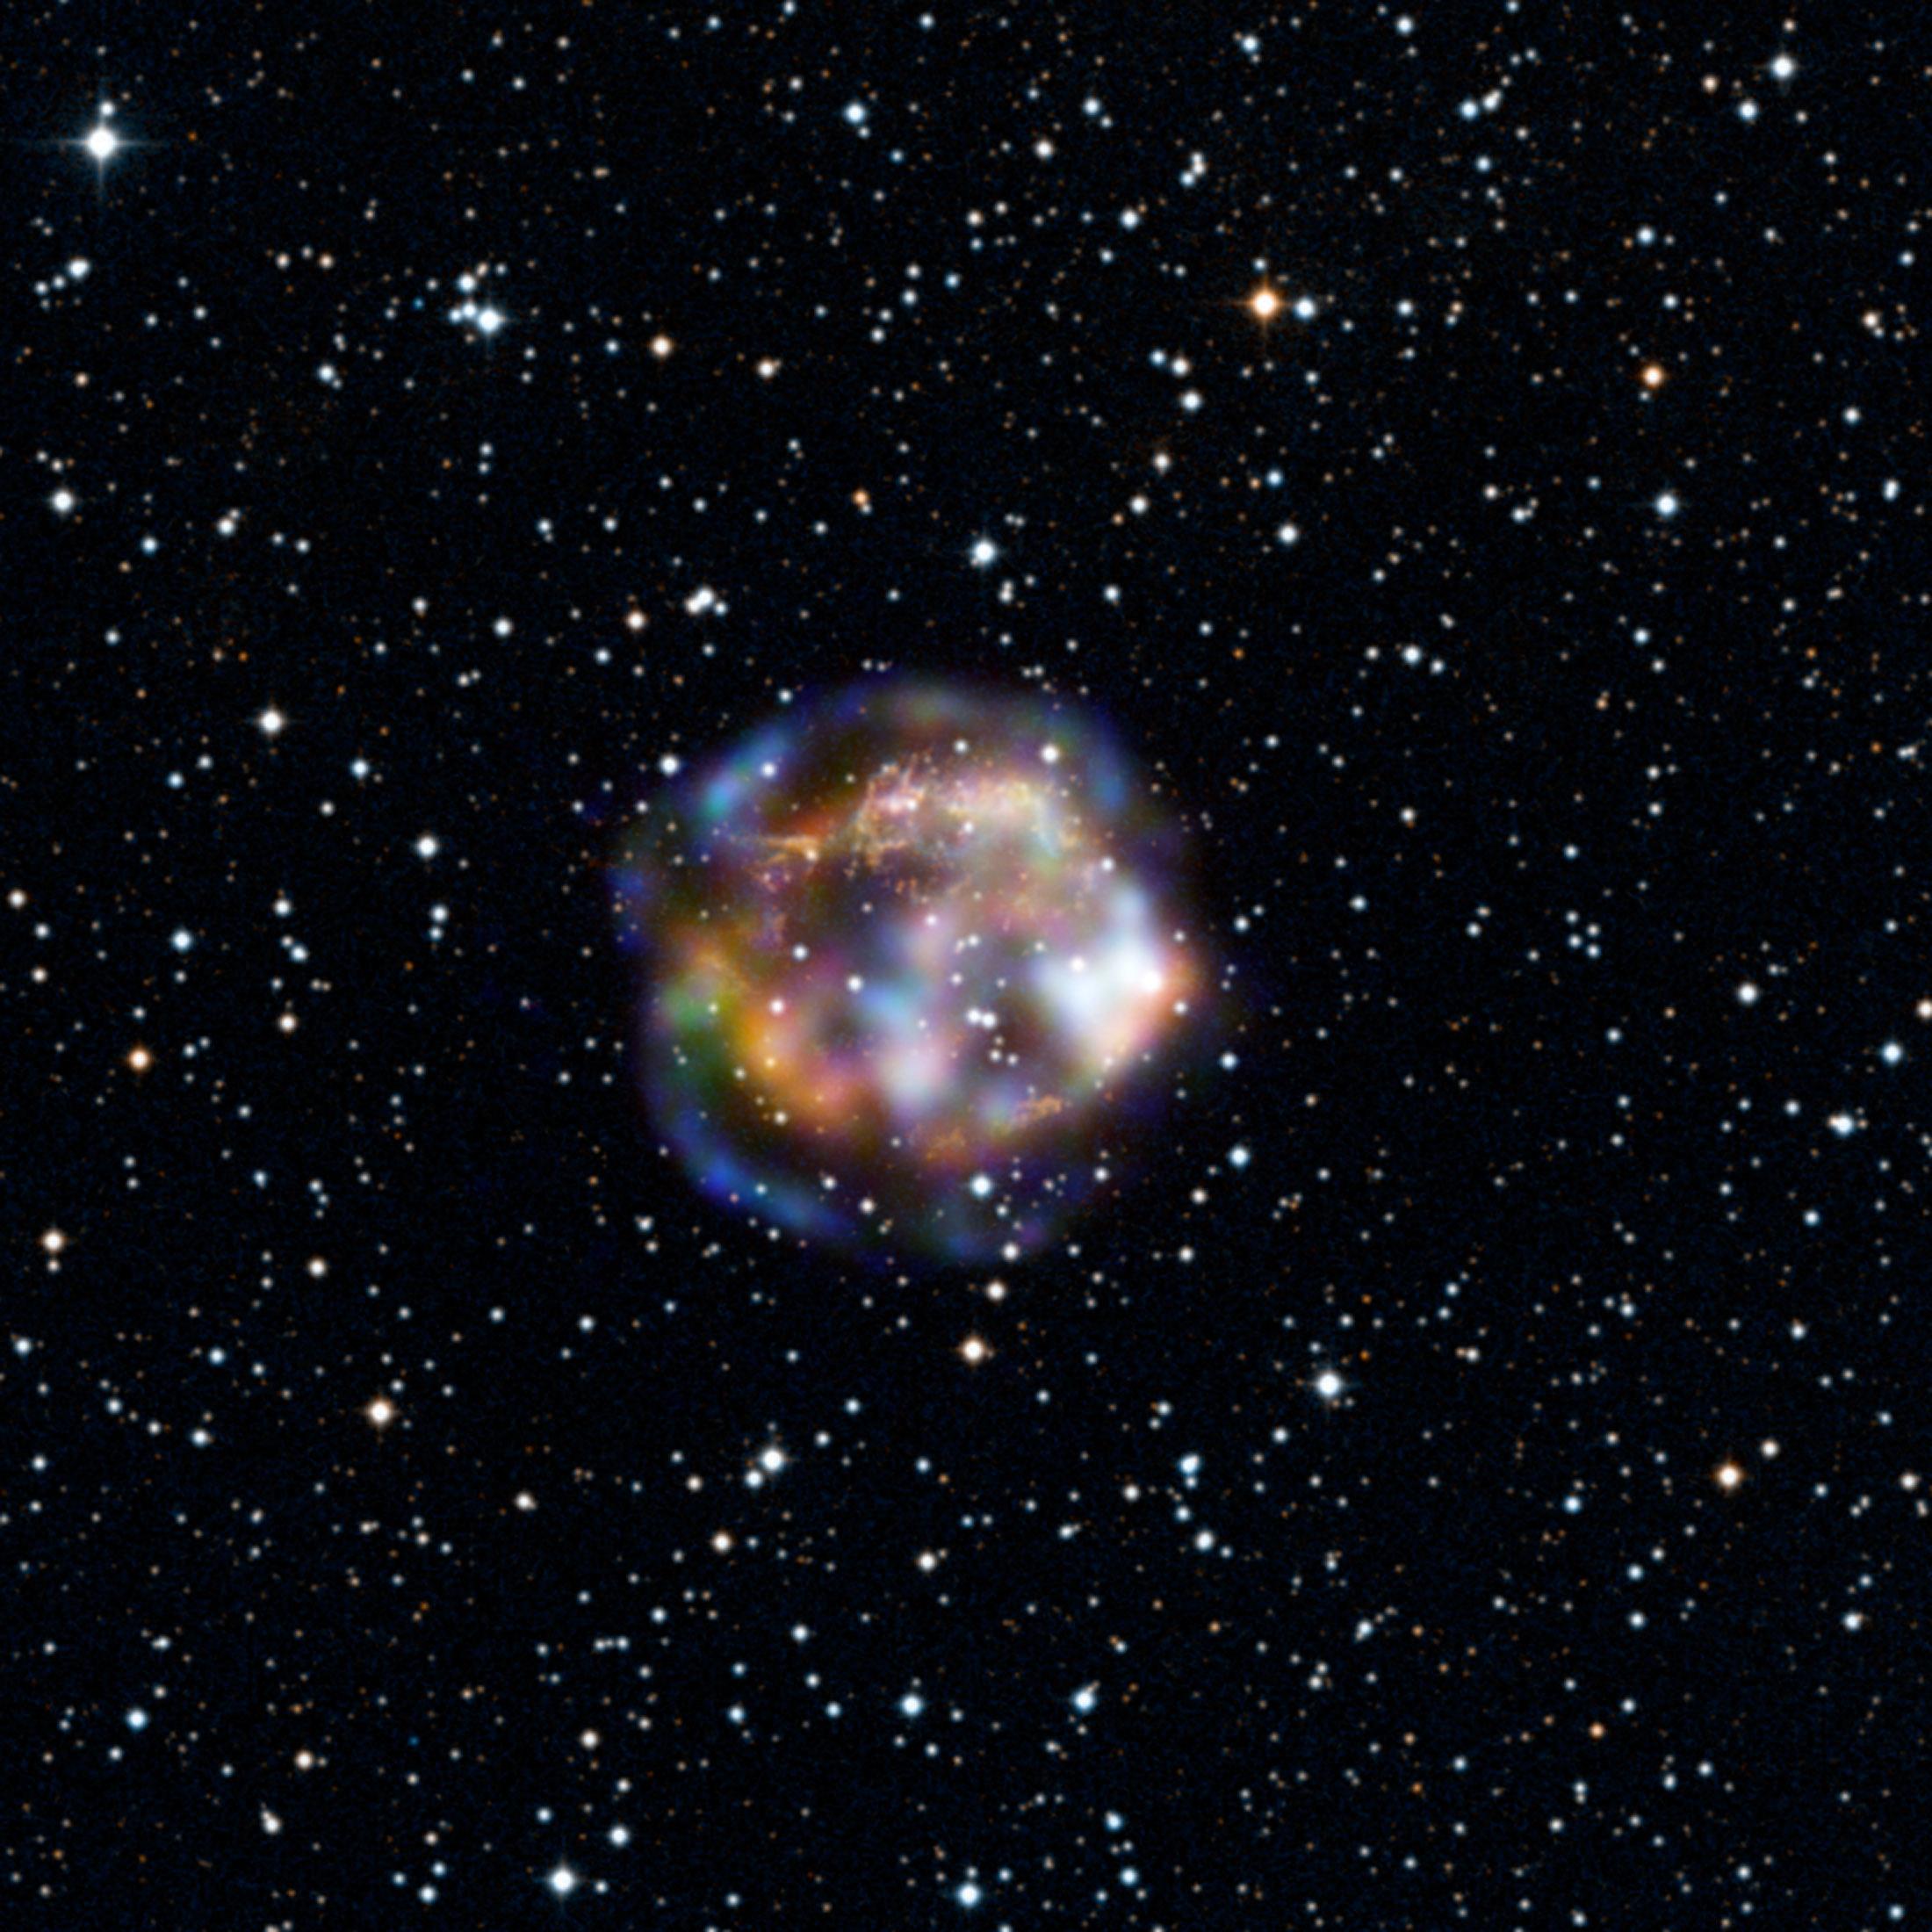 massive star pics from nasa -#main